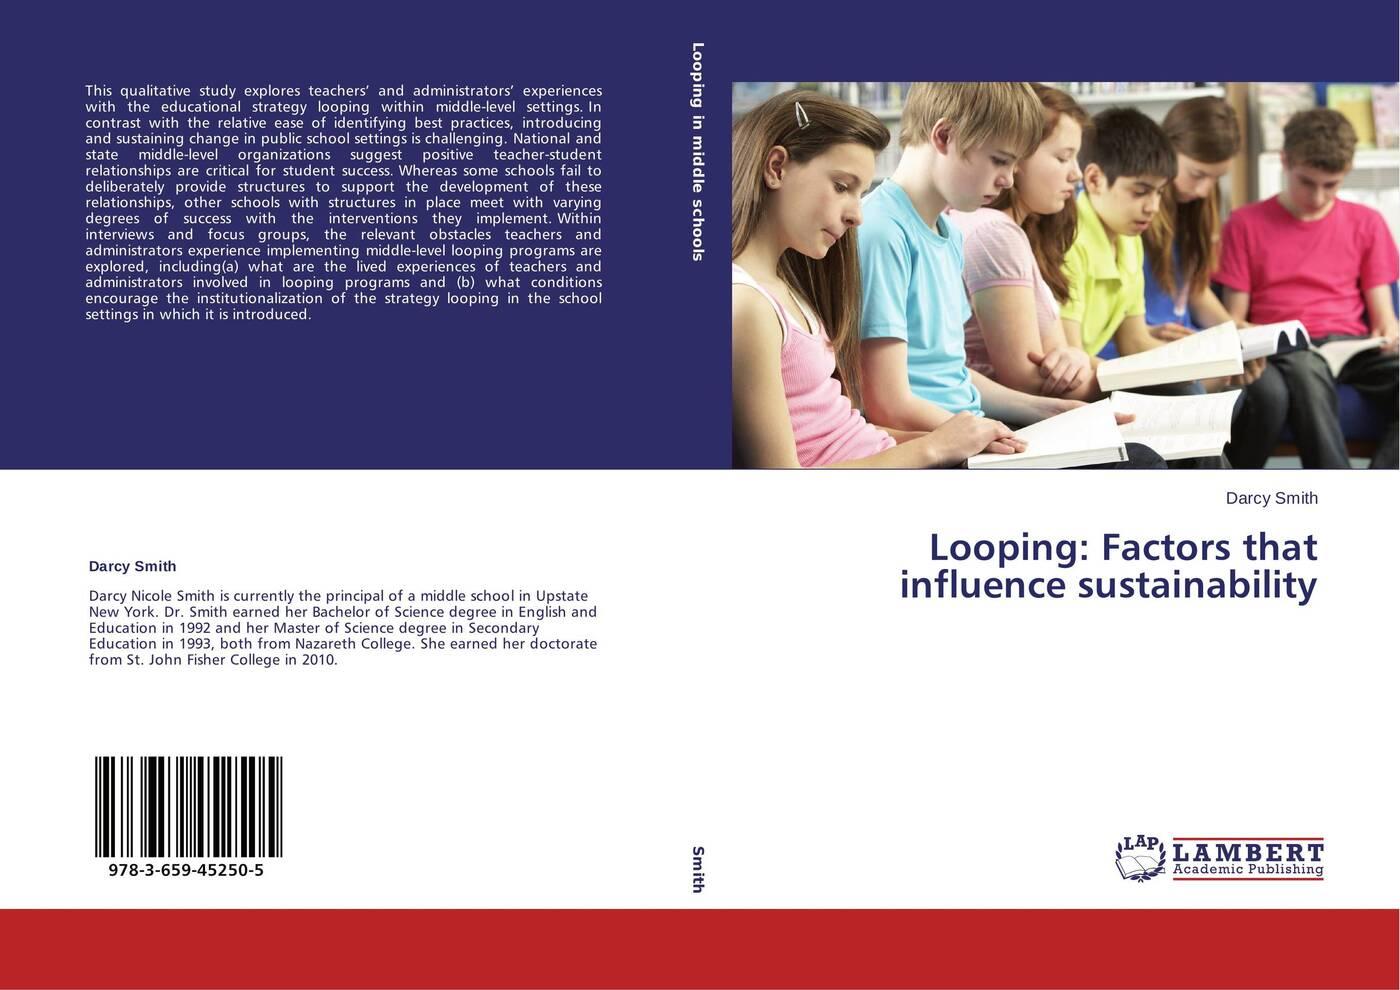 educational film reviewing factors - HD1400×990